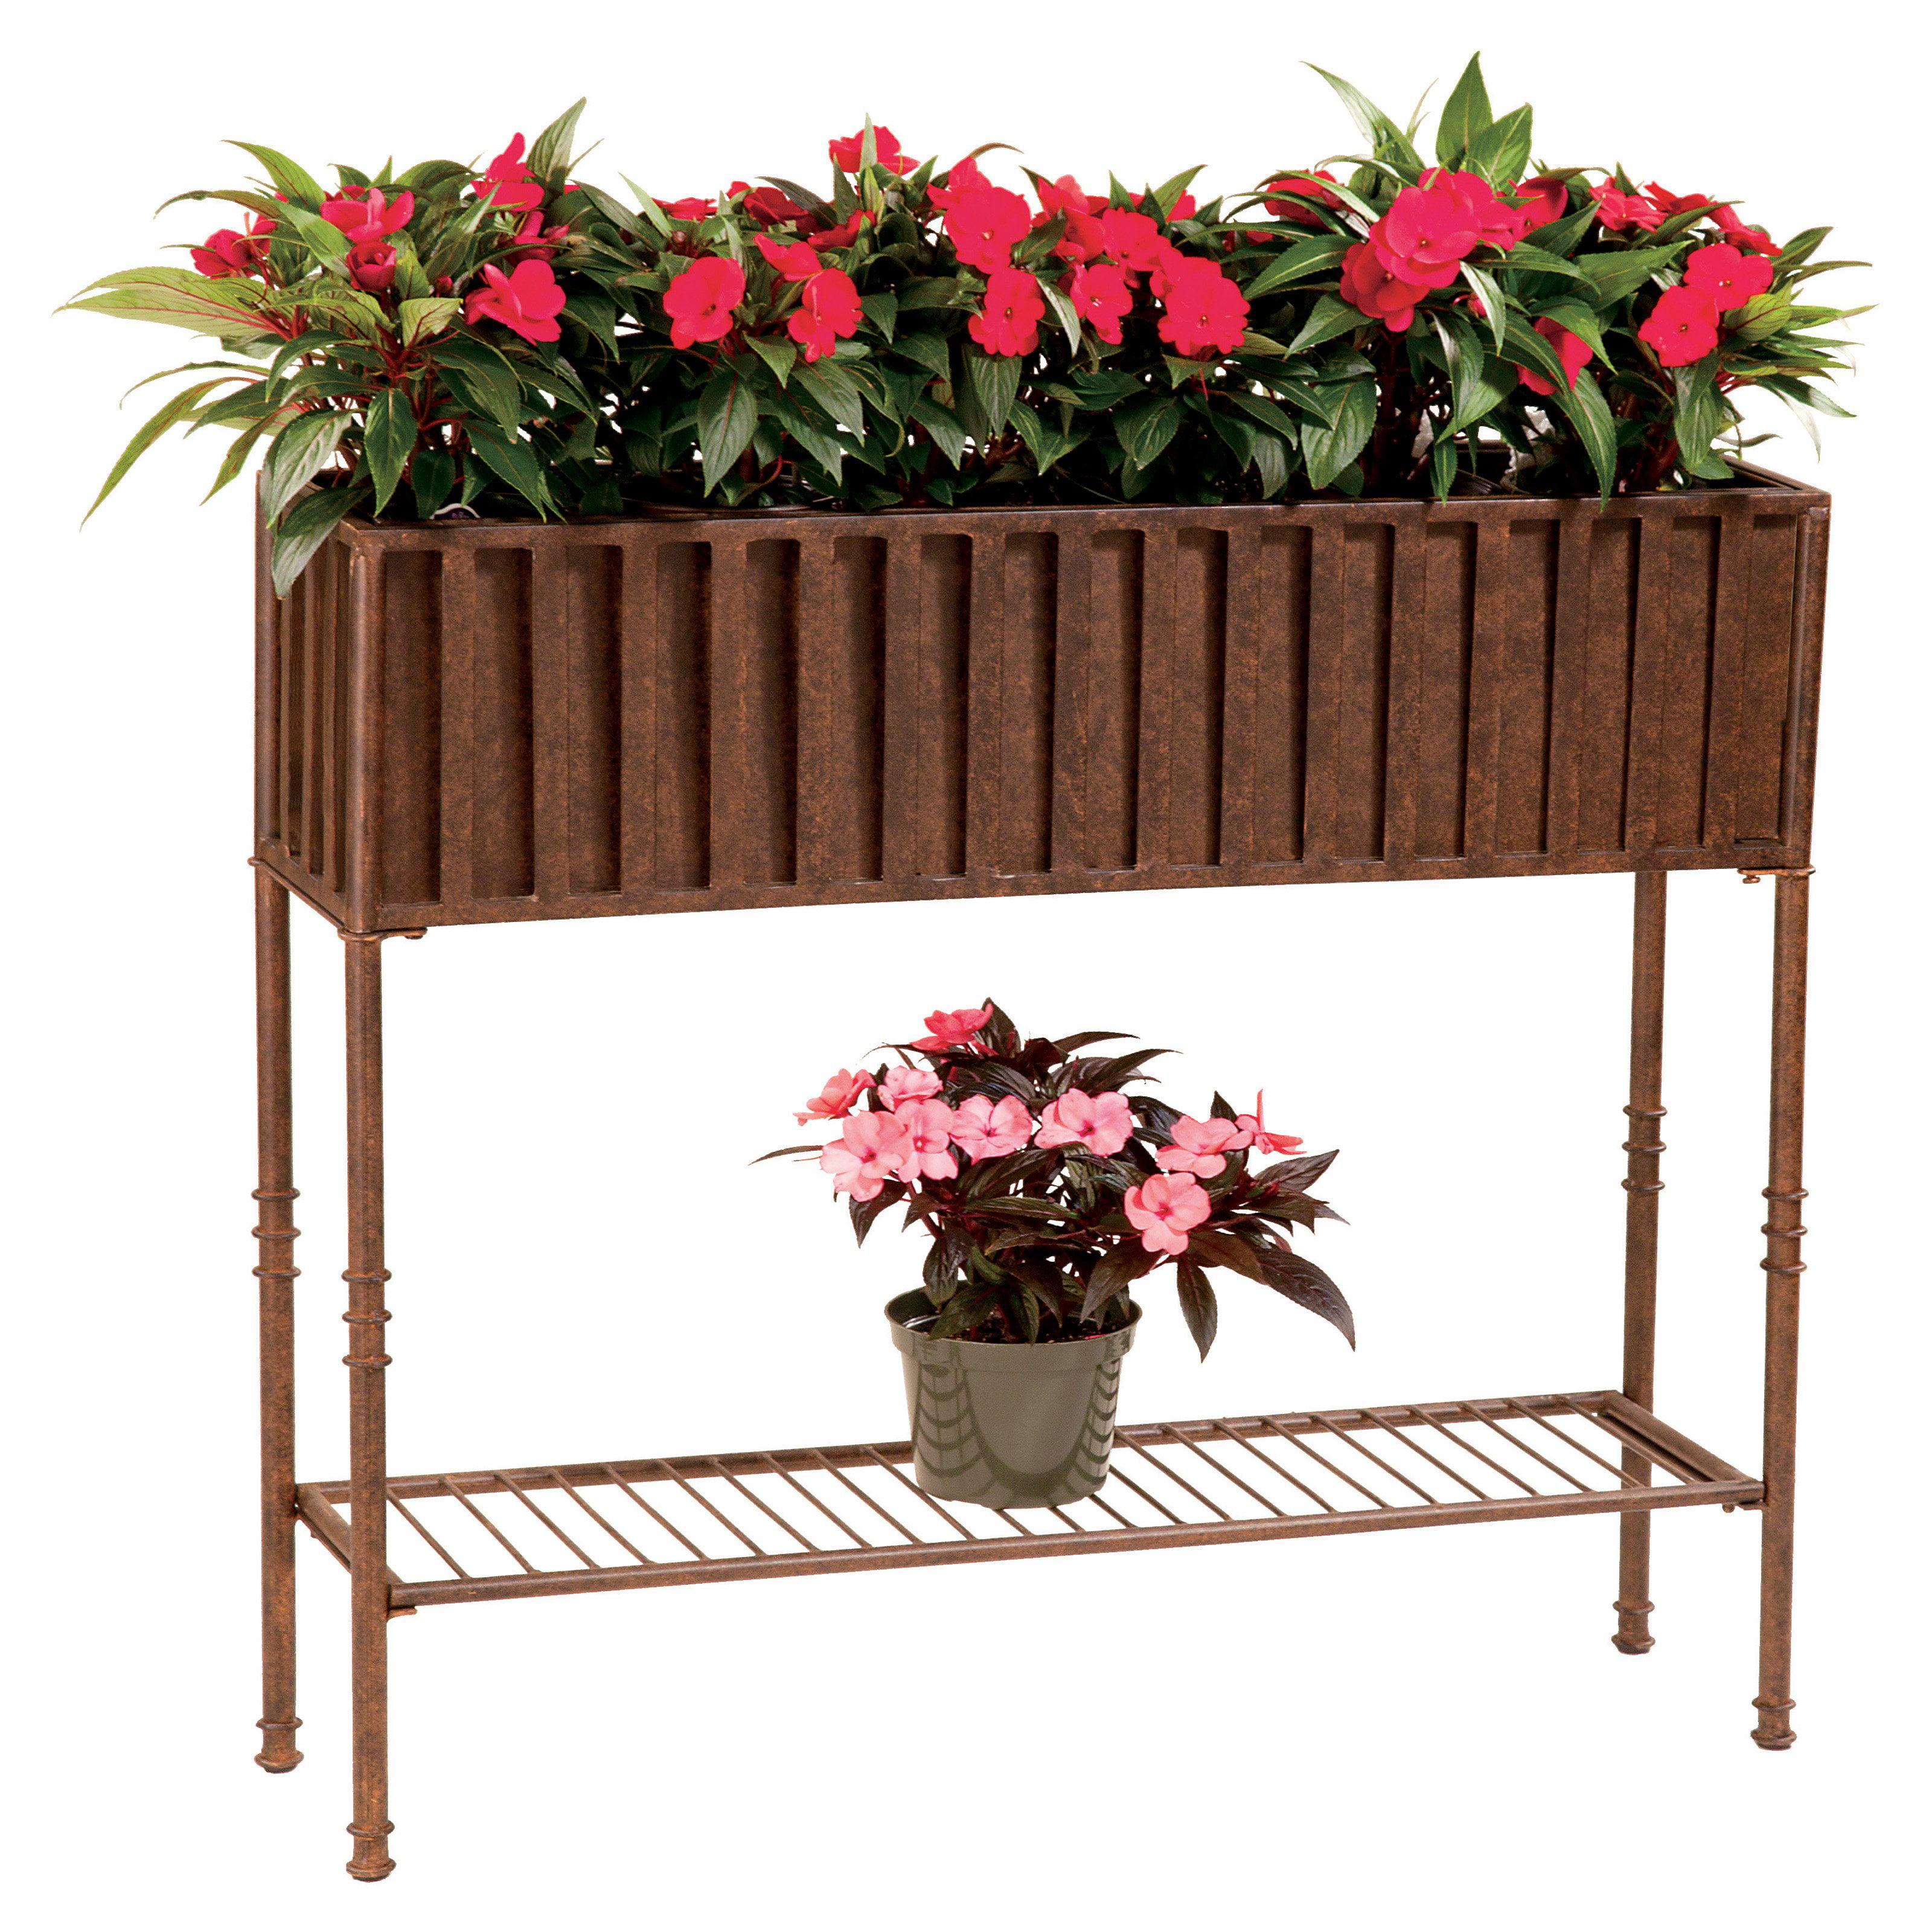 Better Homes And Gardens Dubai 19 Decorative Outdoor Resin Planter Teal